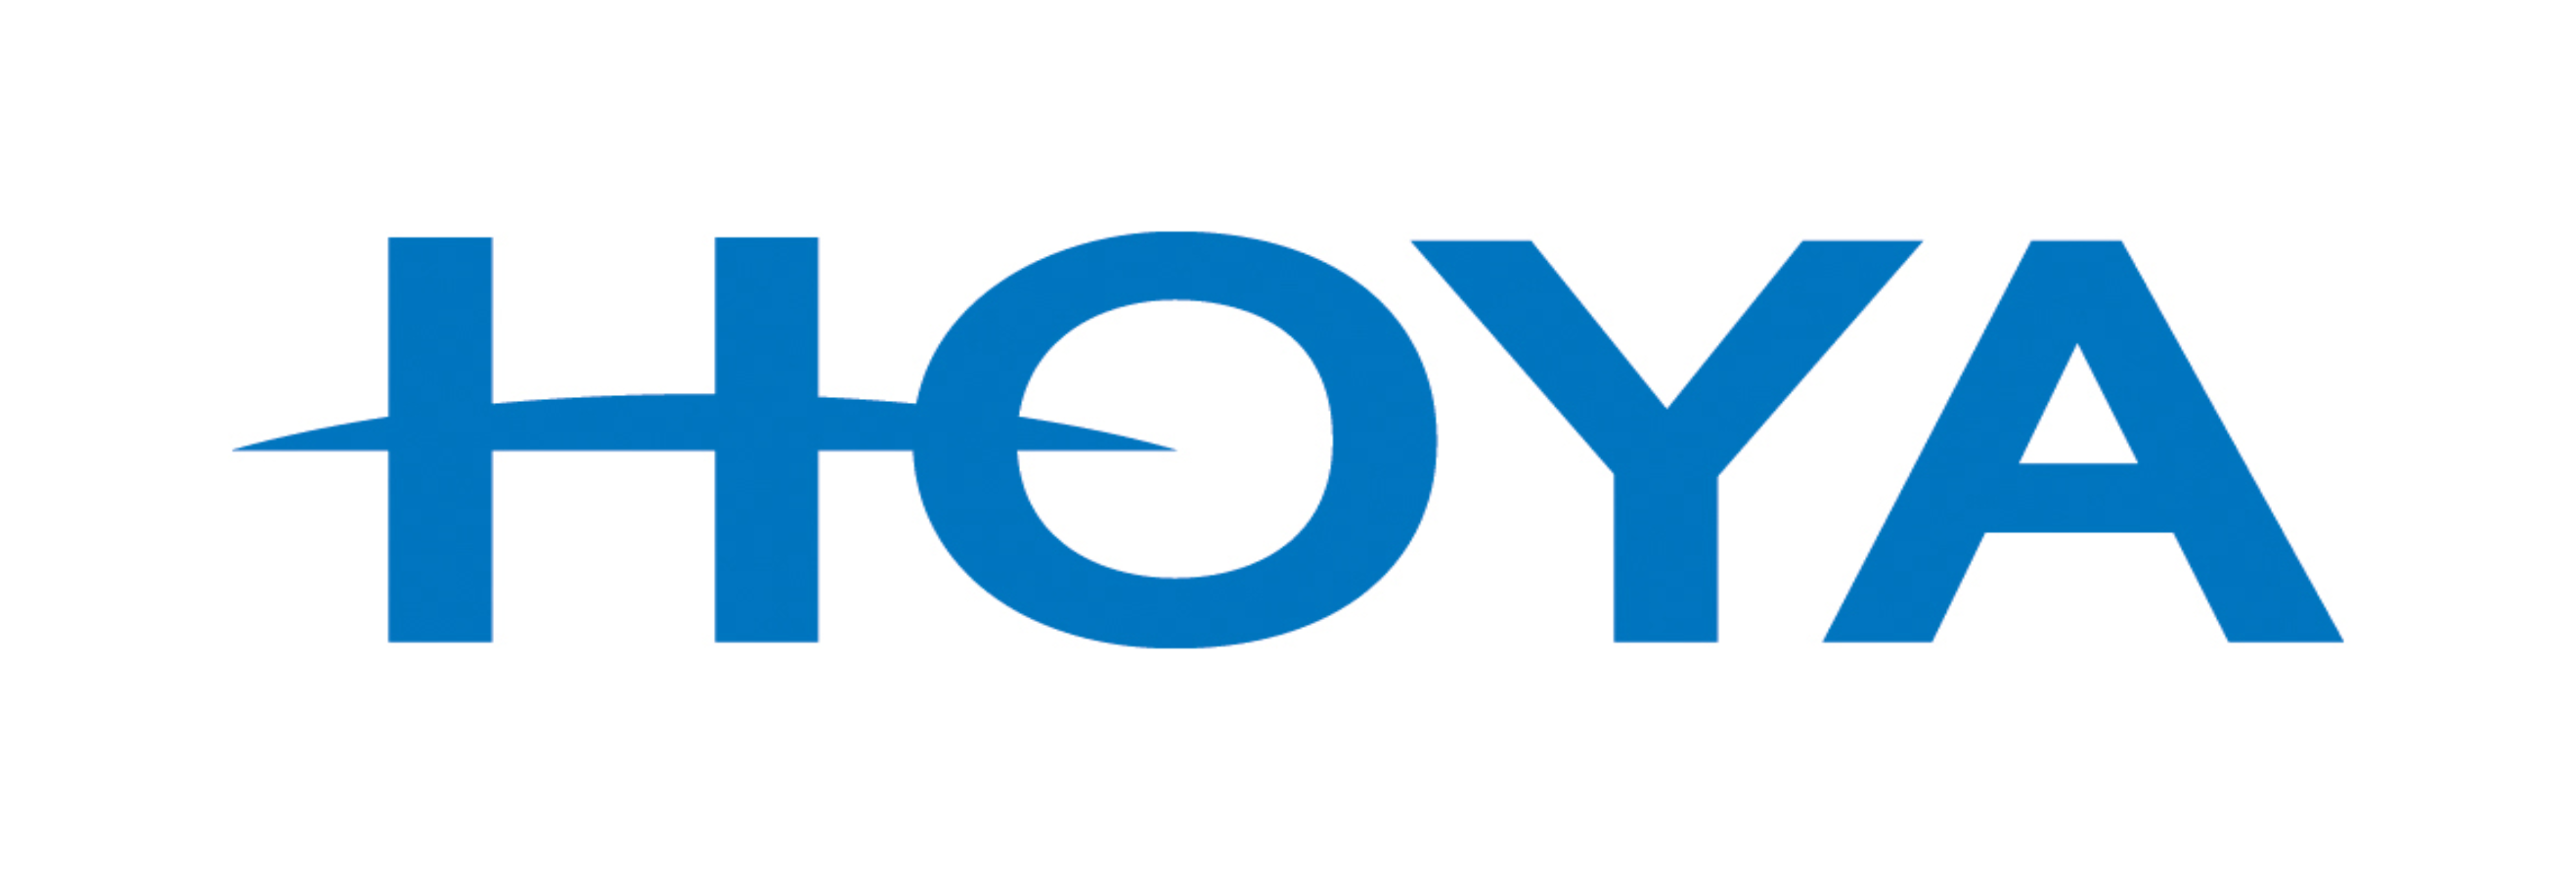 Hoya no-glare processed by IcareLabs